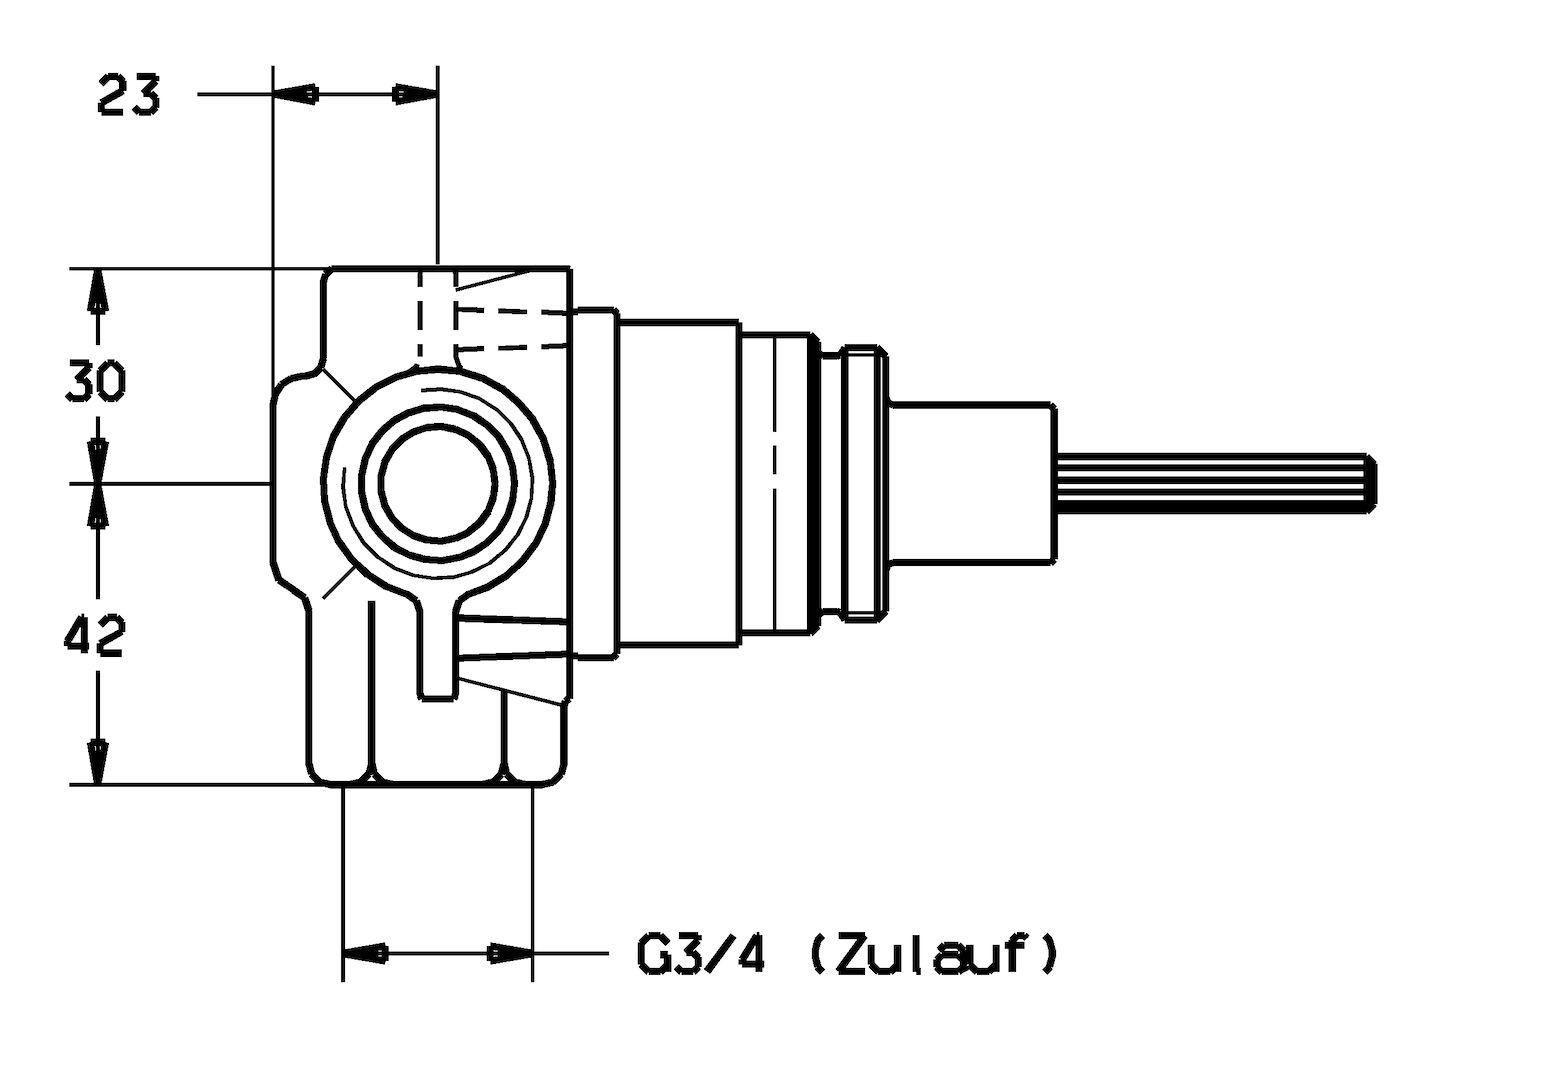 hight resolution of hansa concealed diverter g3 4 dn20 02850100